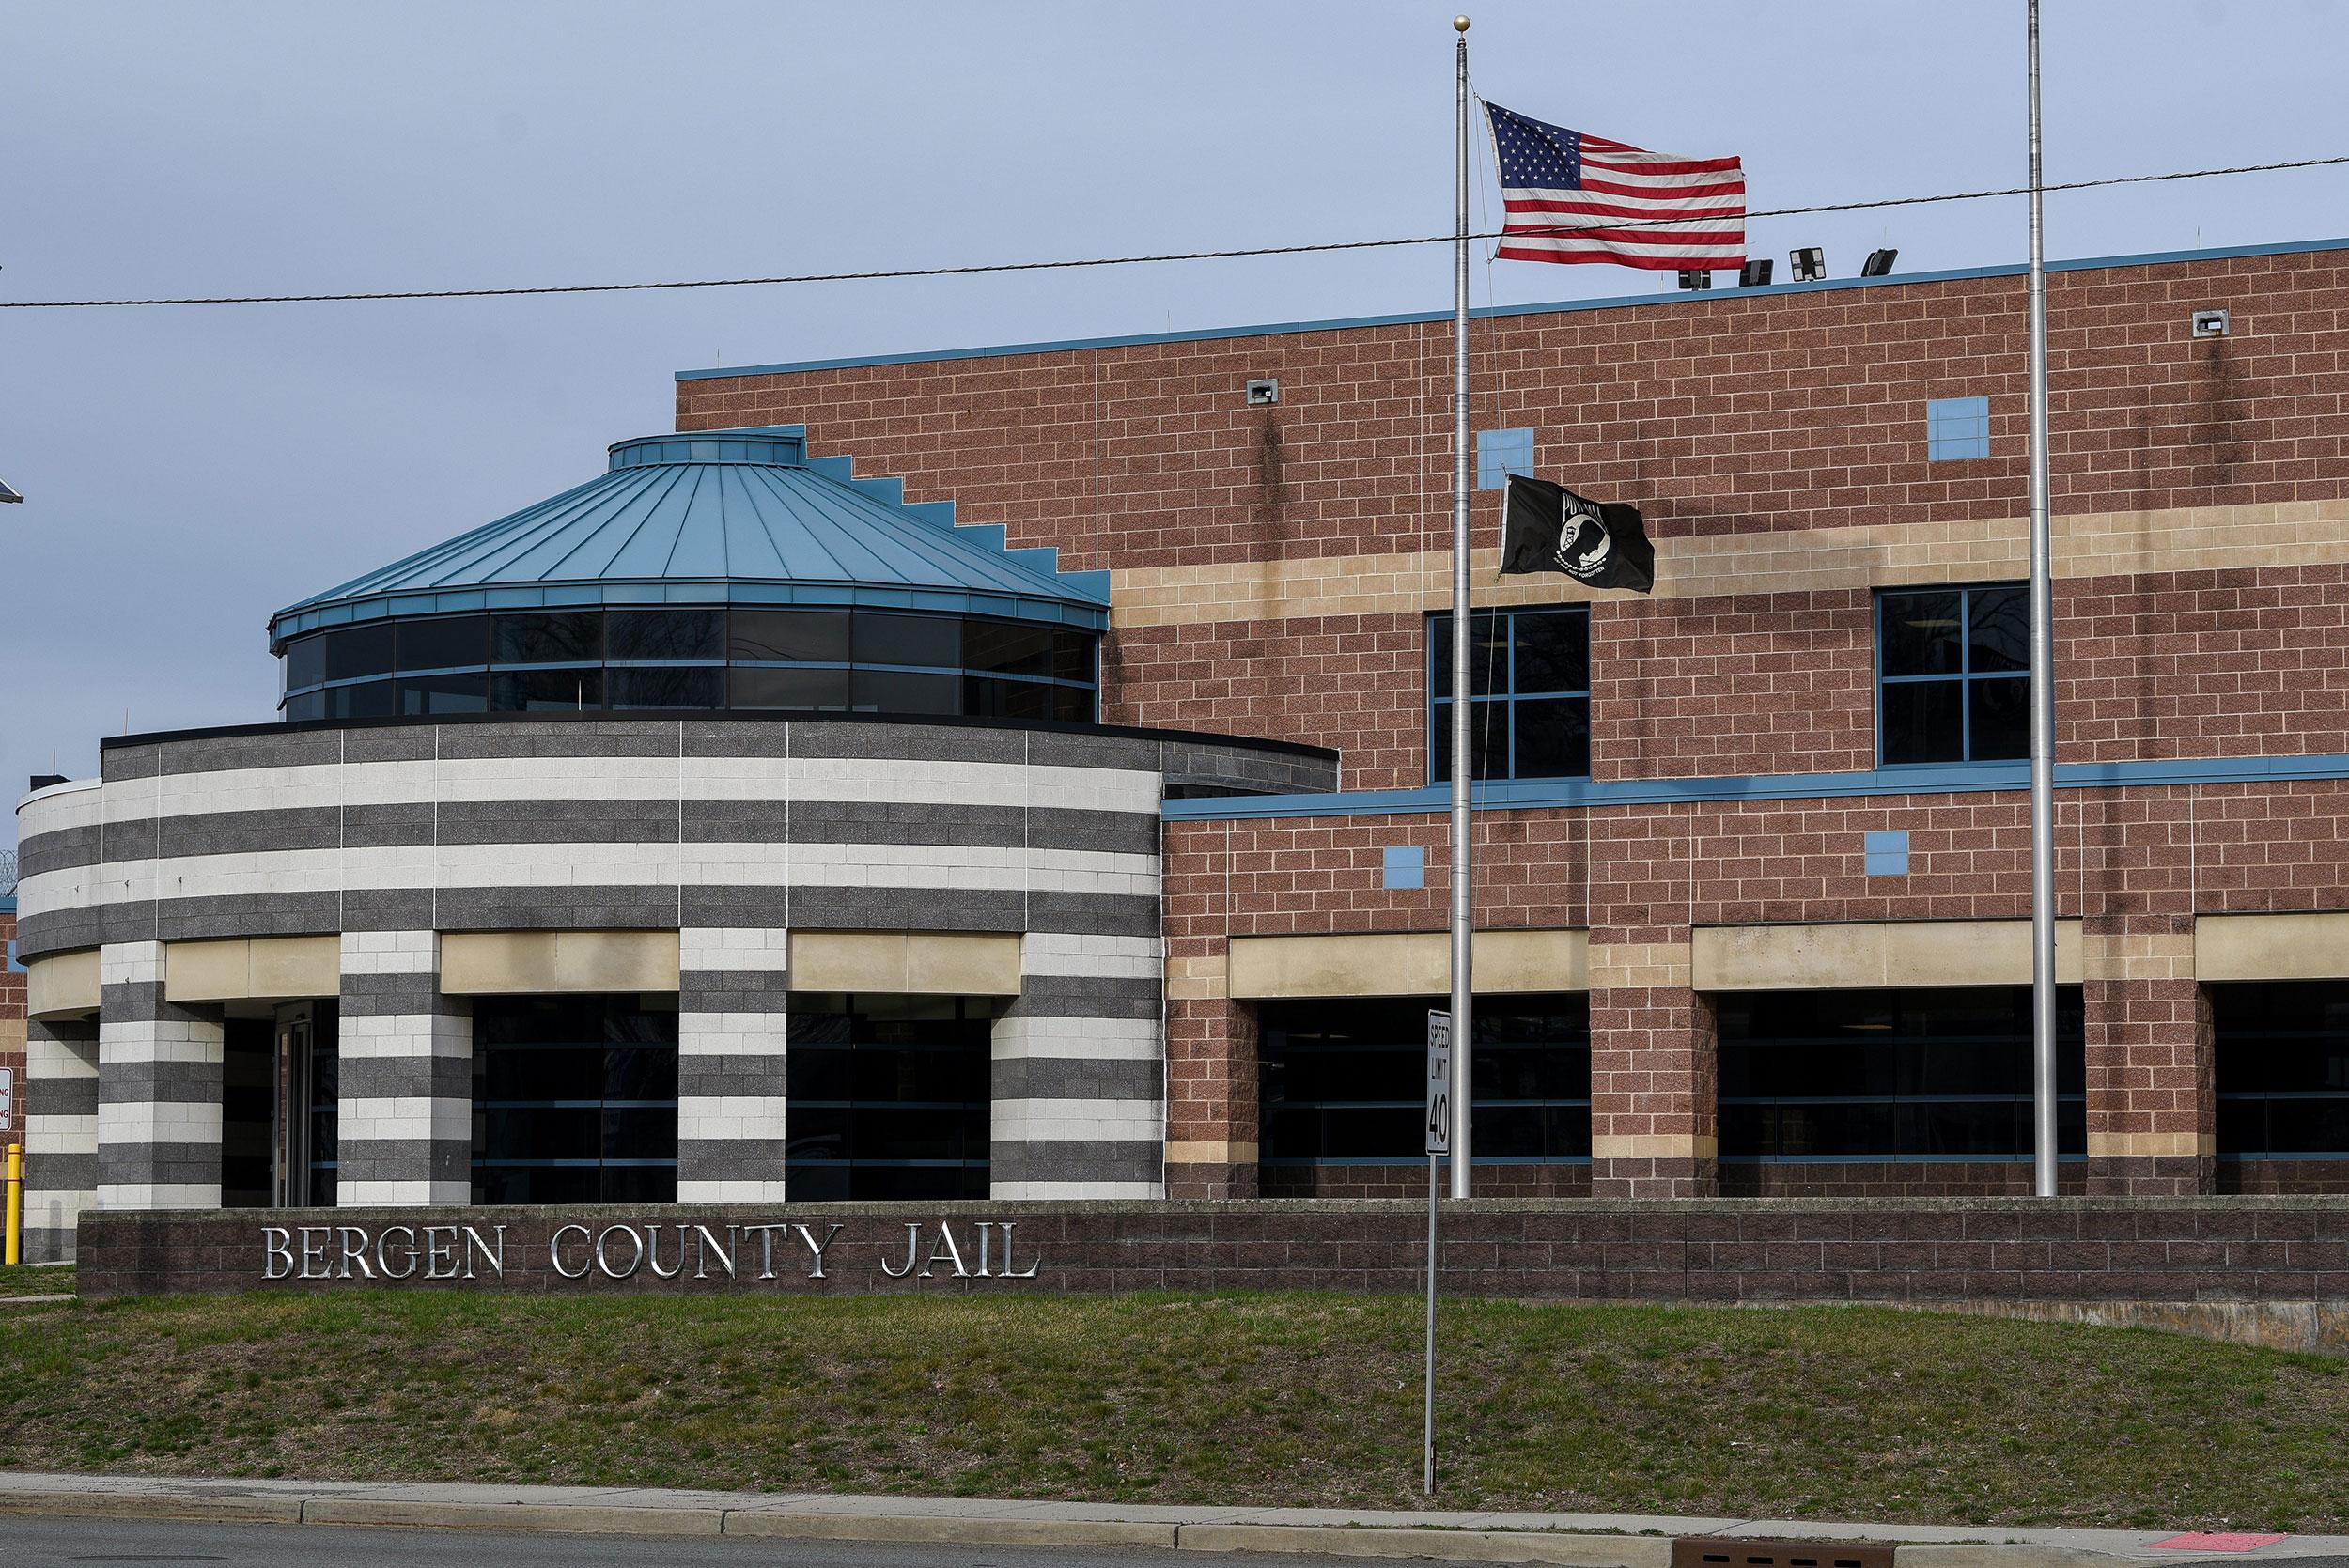 The exterior Bergen County Jail in Hackensack, New Jersey.